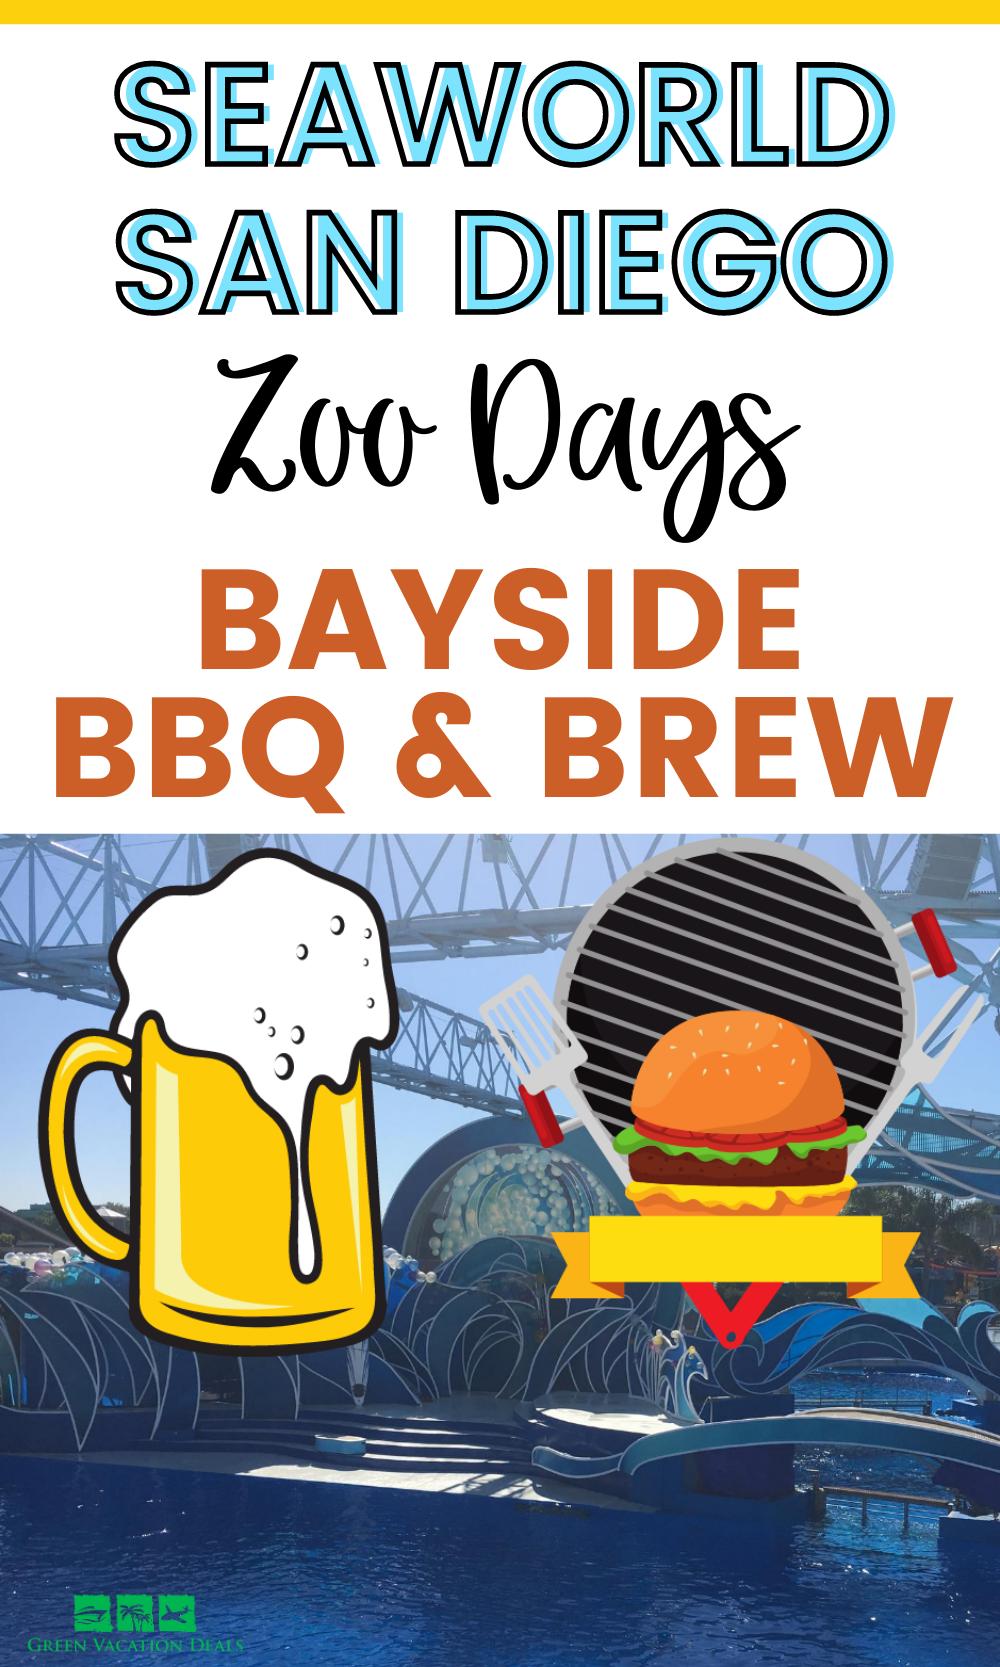 SeaWorld Zoo Days: Bayside BBQ & Brew is a new event at SeaWorld San Diego theme park in Southern California. Enjoy animal exhibitions & presentations, live music, BBQ dishes (St. Louis BBQ Ribs, pork slider, Chicken Quesadilla, Salmon, etc.) & local craft beer, wine & cocktails #SanDiego #SeaWorld #SeaWorldSanDiego #BBQ #Beer #SouthernCalifornia #Miramar #LA #Escondido #Coronado #SoCal #LosAngeles #craftbeer #localbeer #SolanaBeach #PasoRobles #SanDiegoCalifornia #Carlsbad #ChulaVista #barbeque